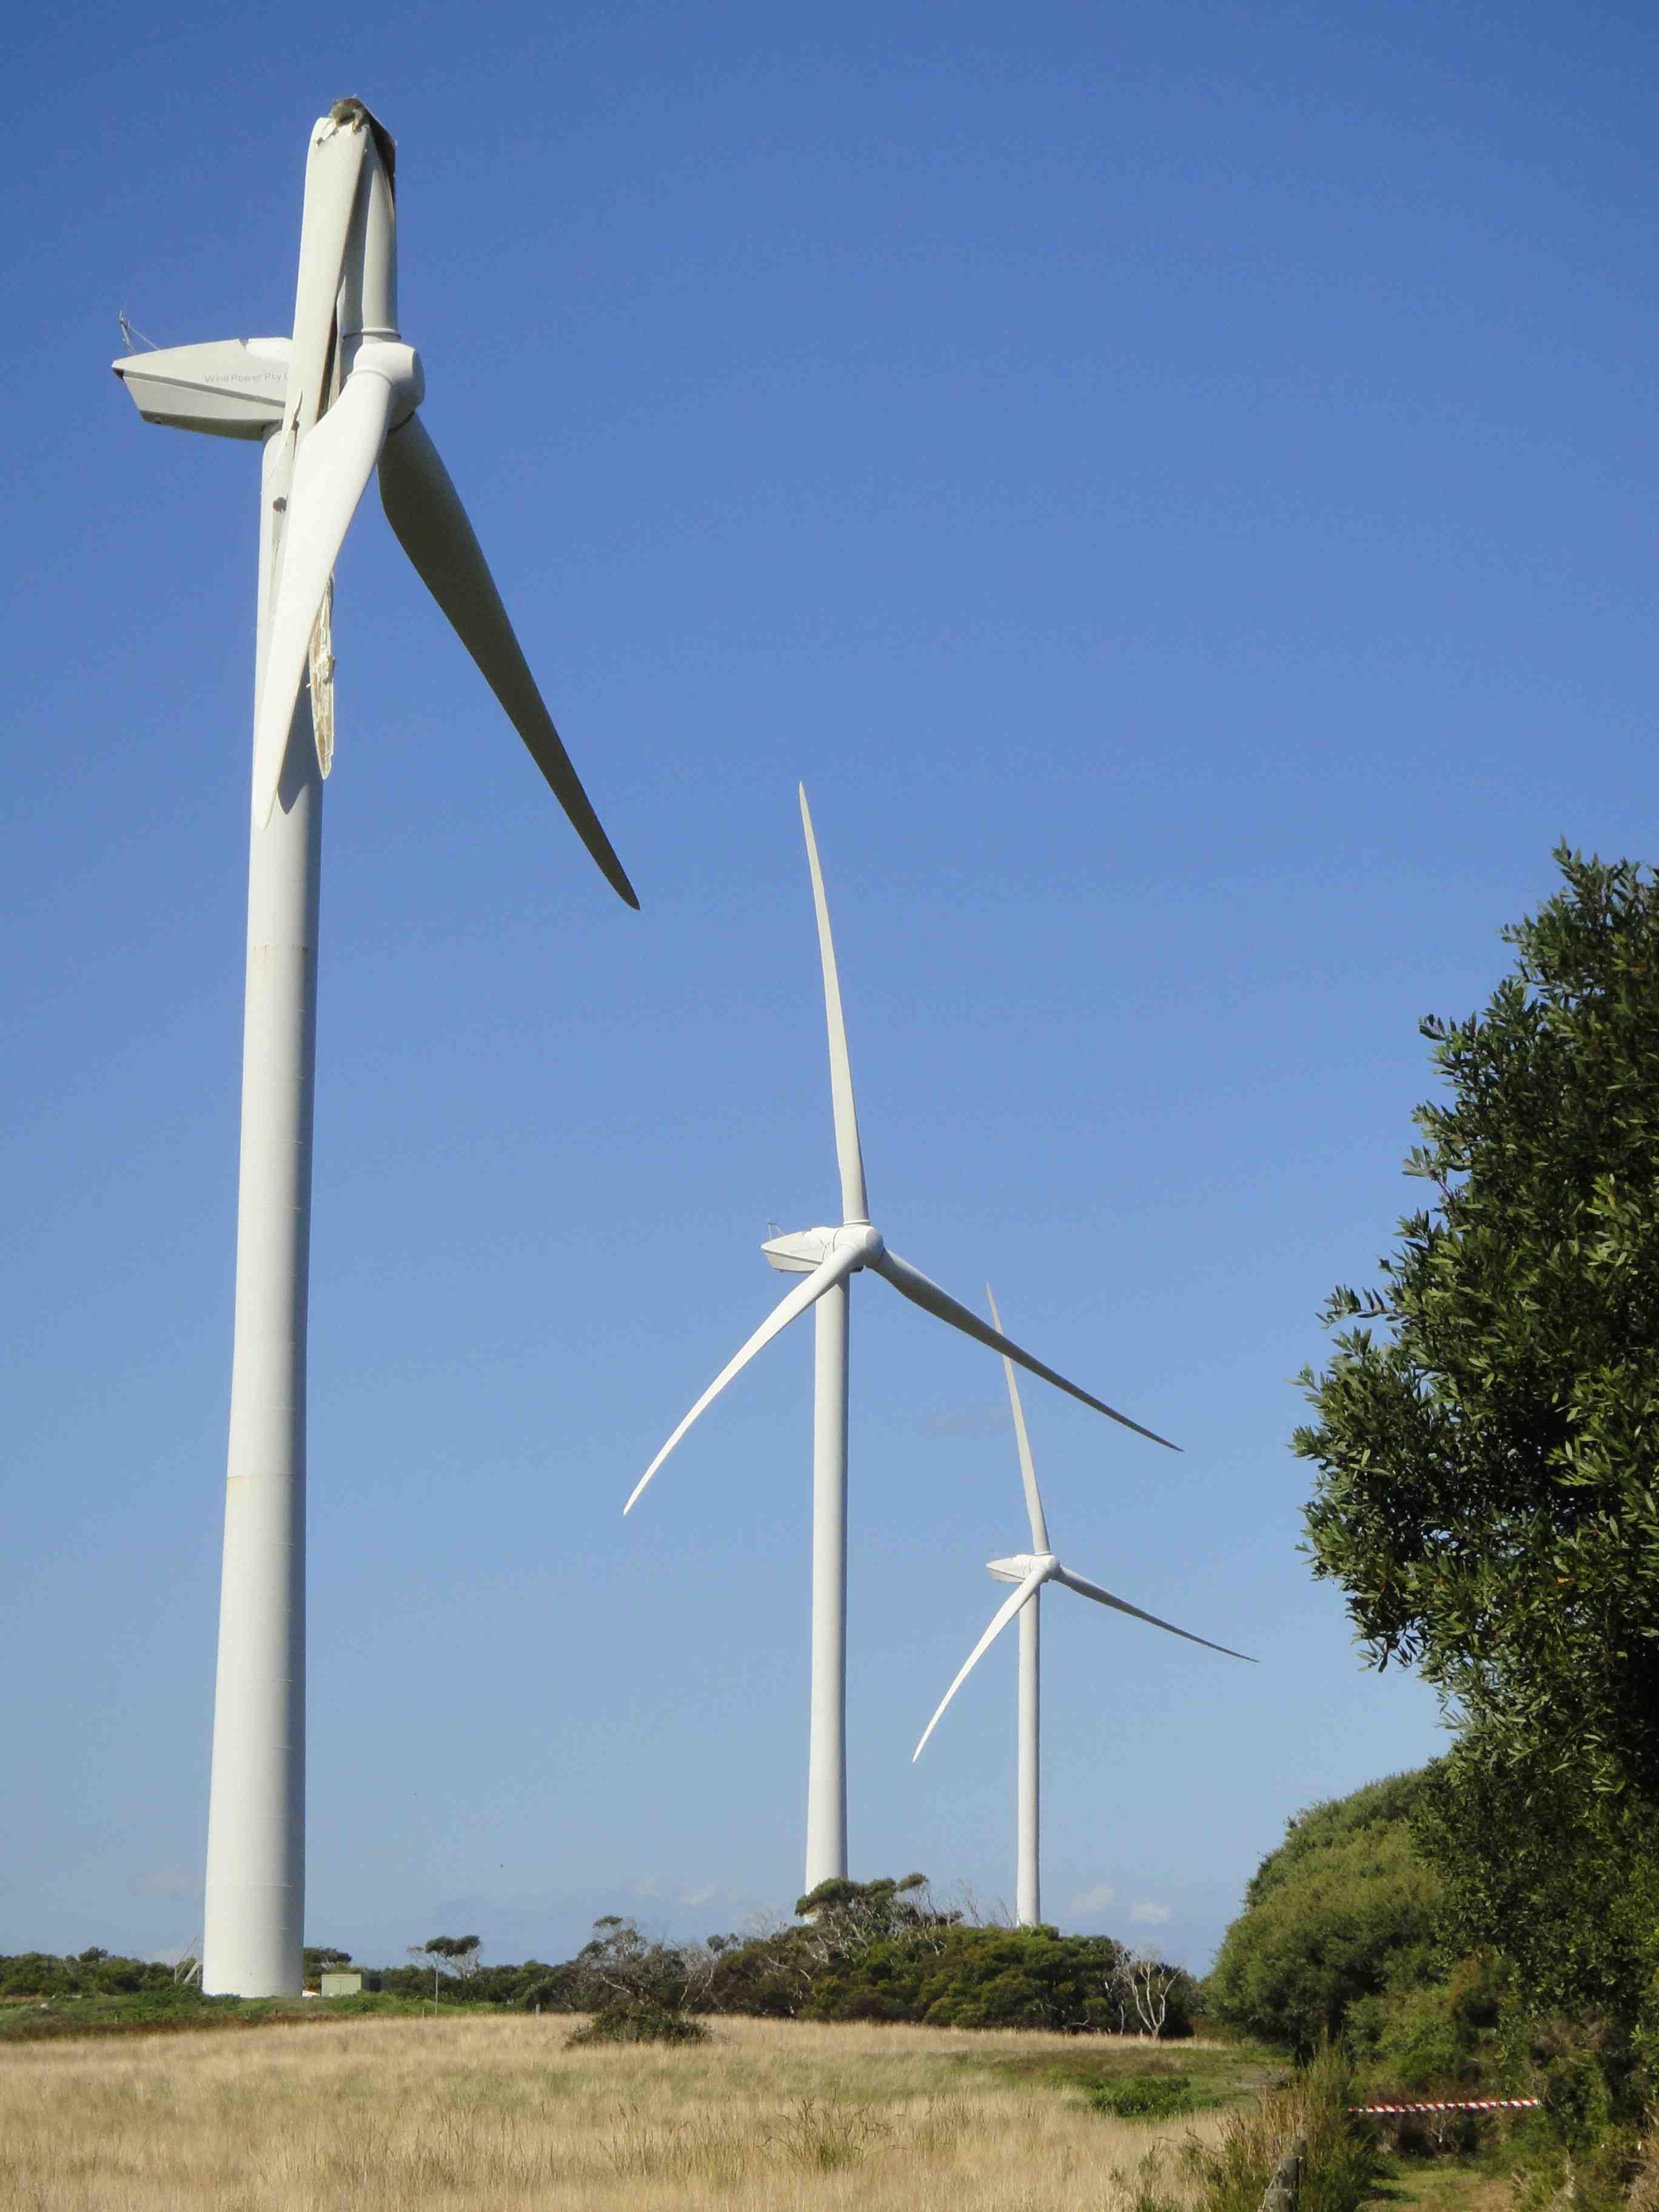 Wind turbine thunderstruck at Wonthaggi